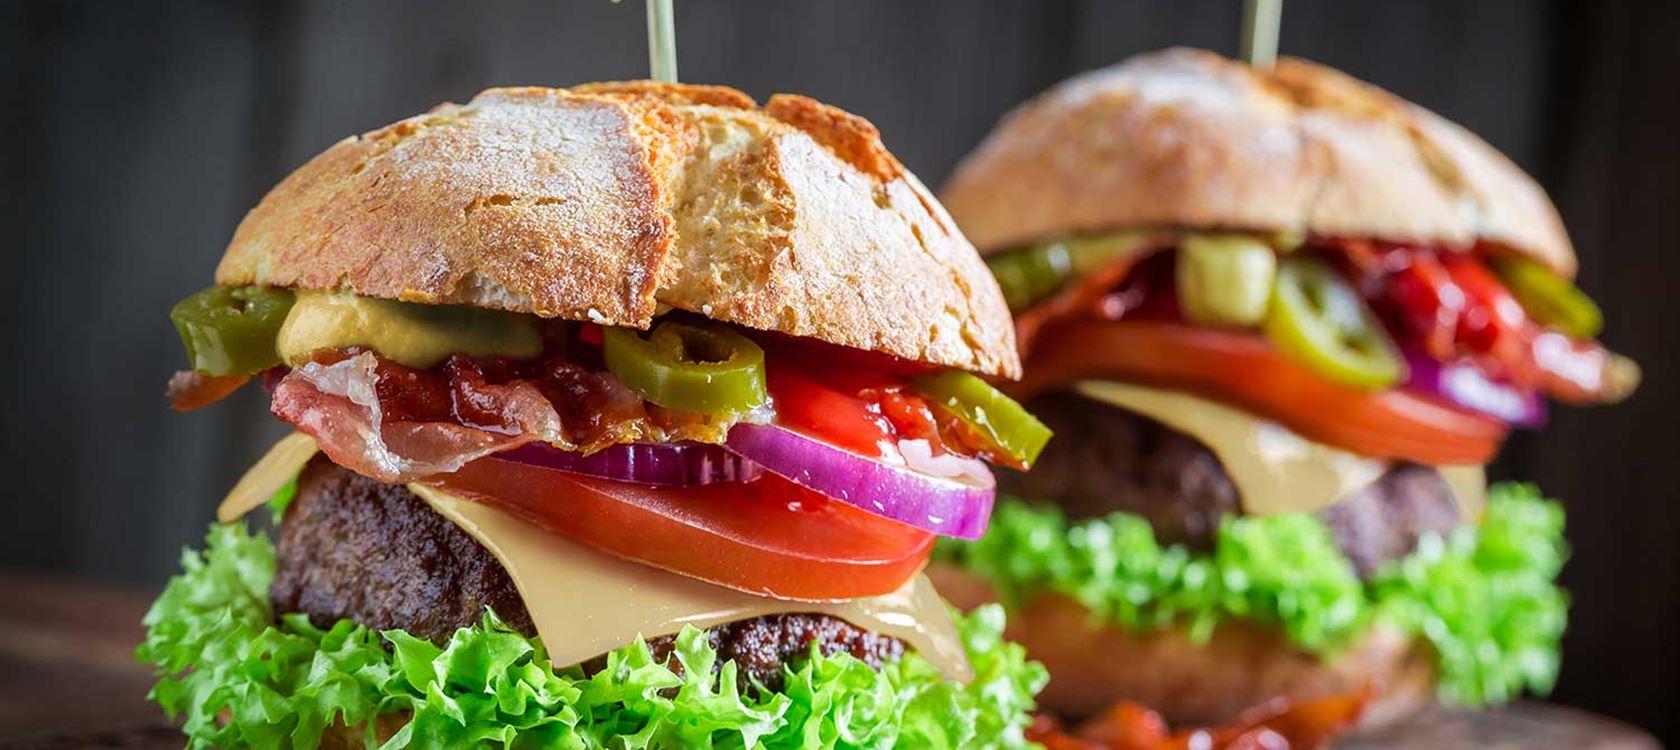 Burger μοσχάρι με Arla Mozzarella και sauce μουστάρδας με Arla Φρέσκο Τυρί Κρέμα